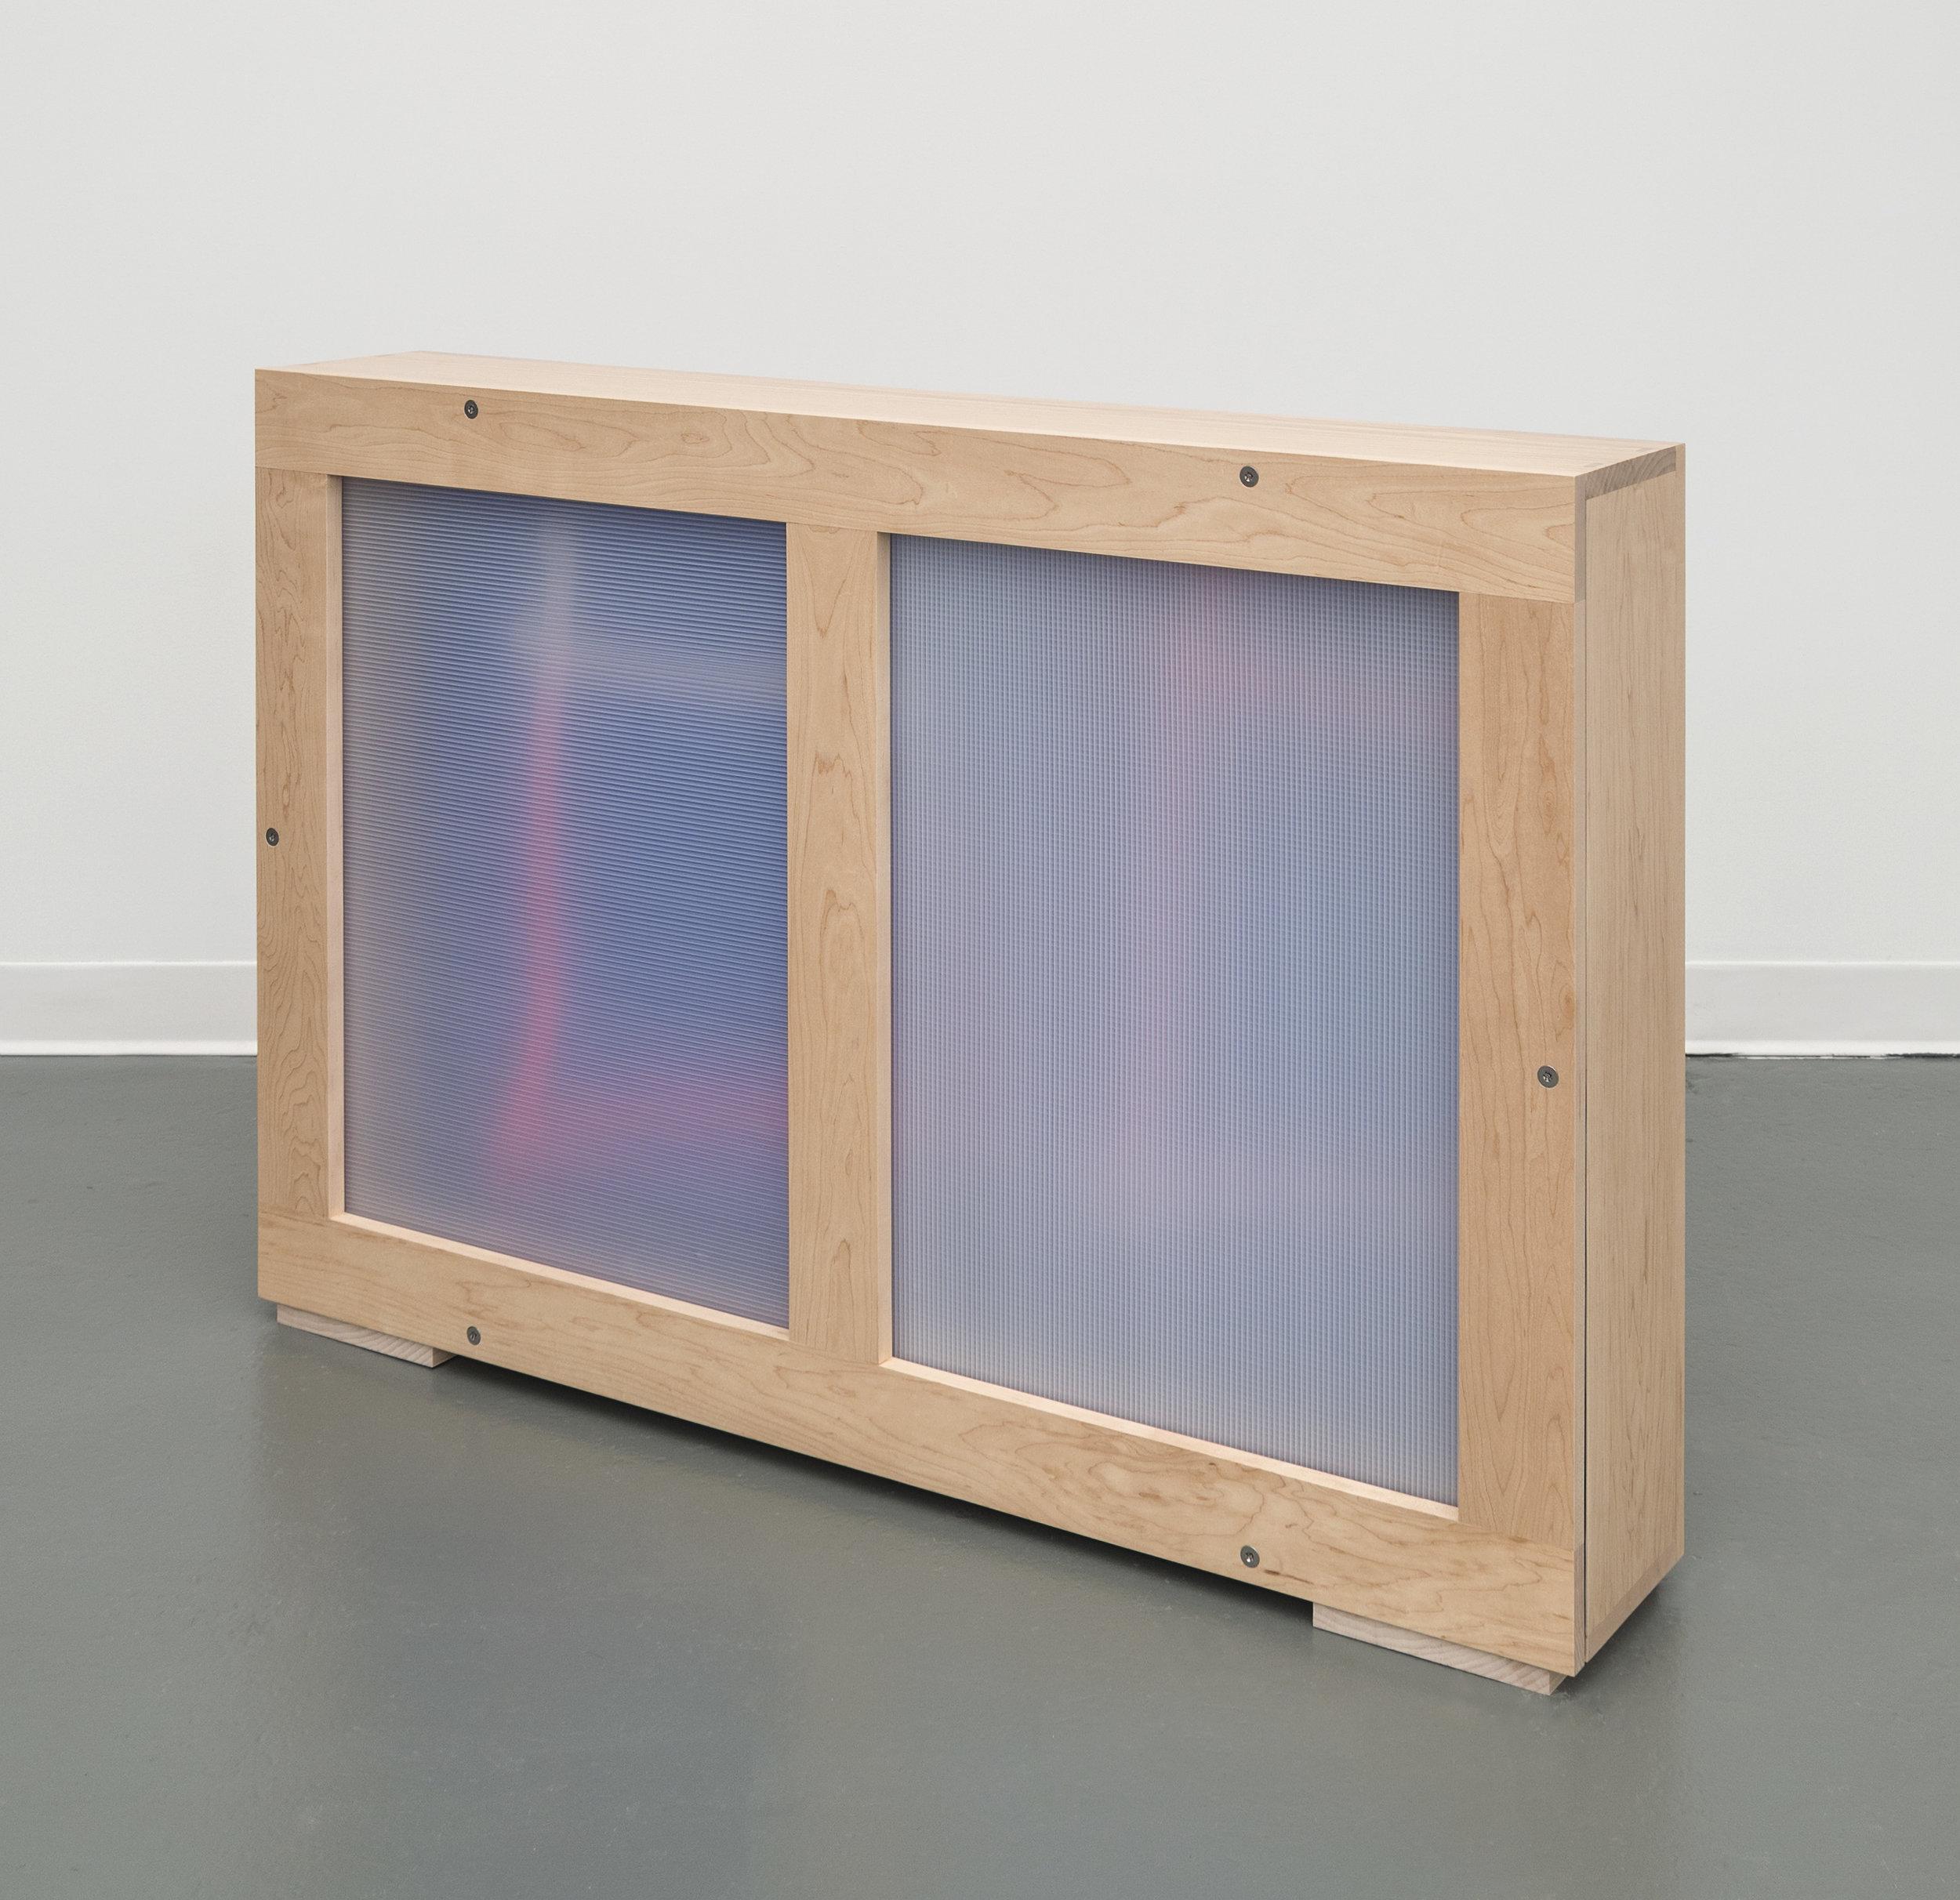 John-Corbett-Artist-Contact-Paintings-III-2.jpg